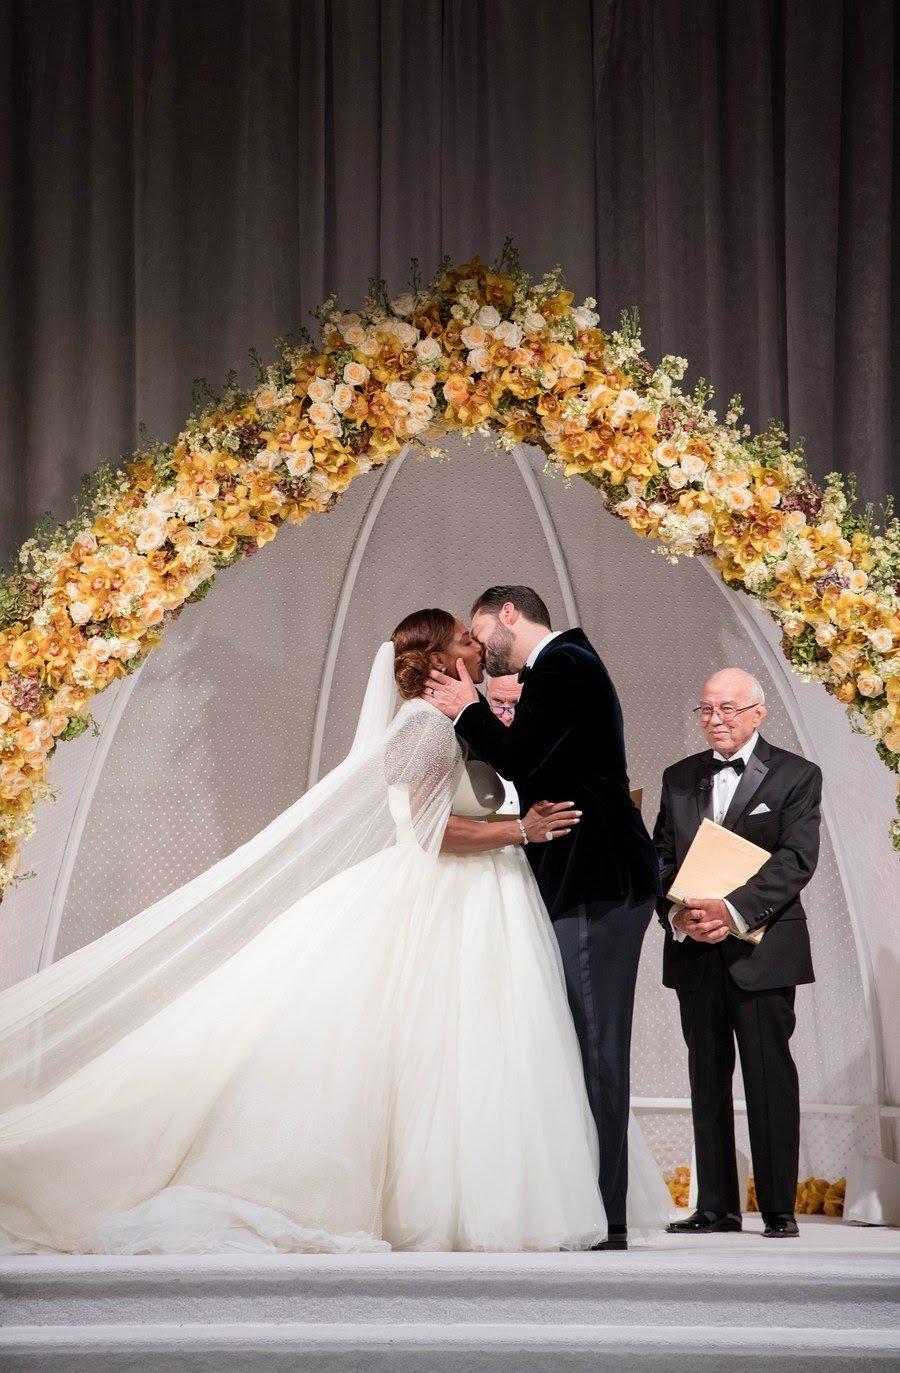 Serena and Alexis Wedding